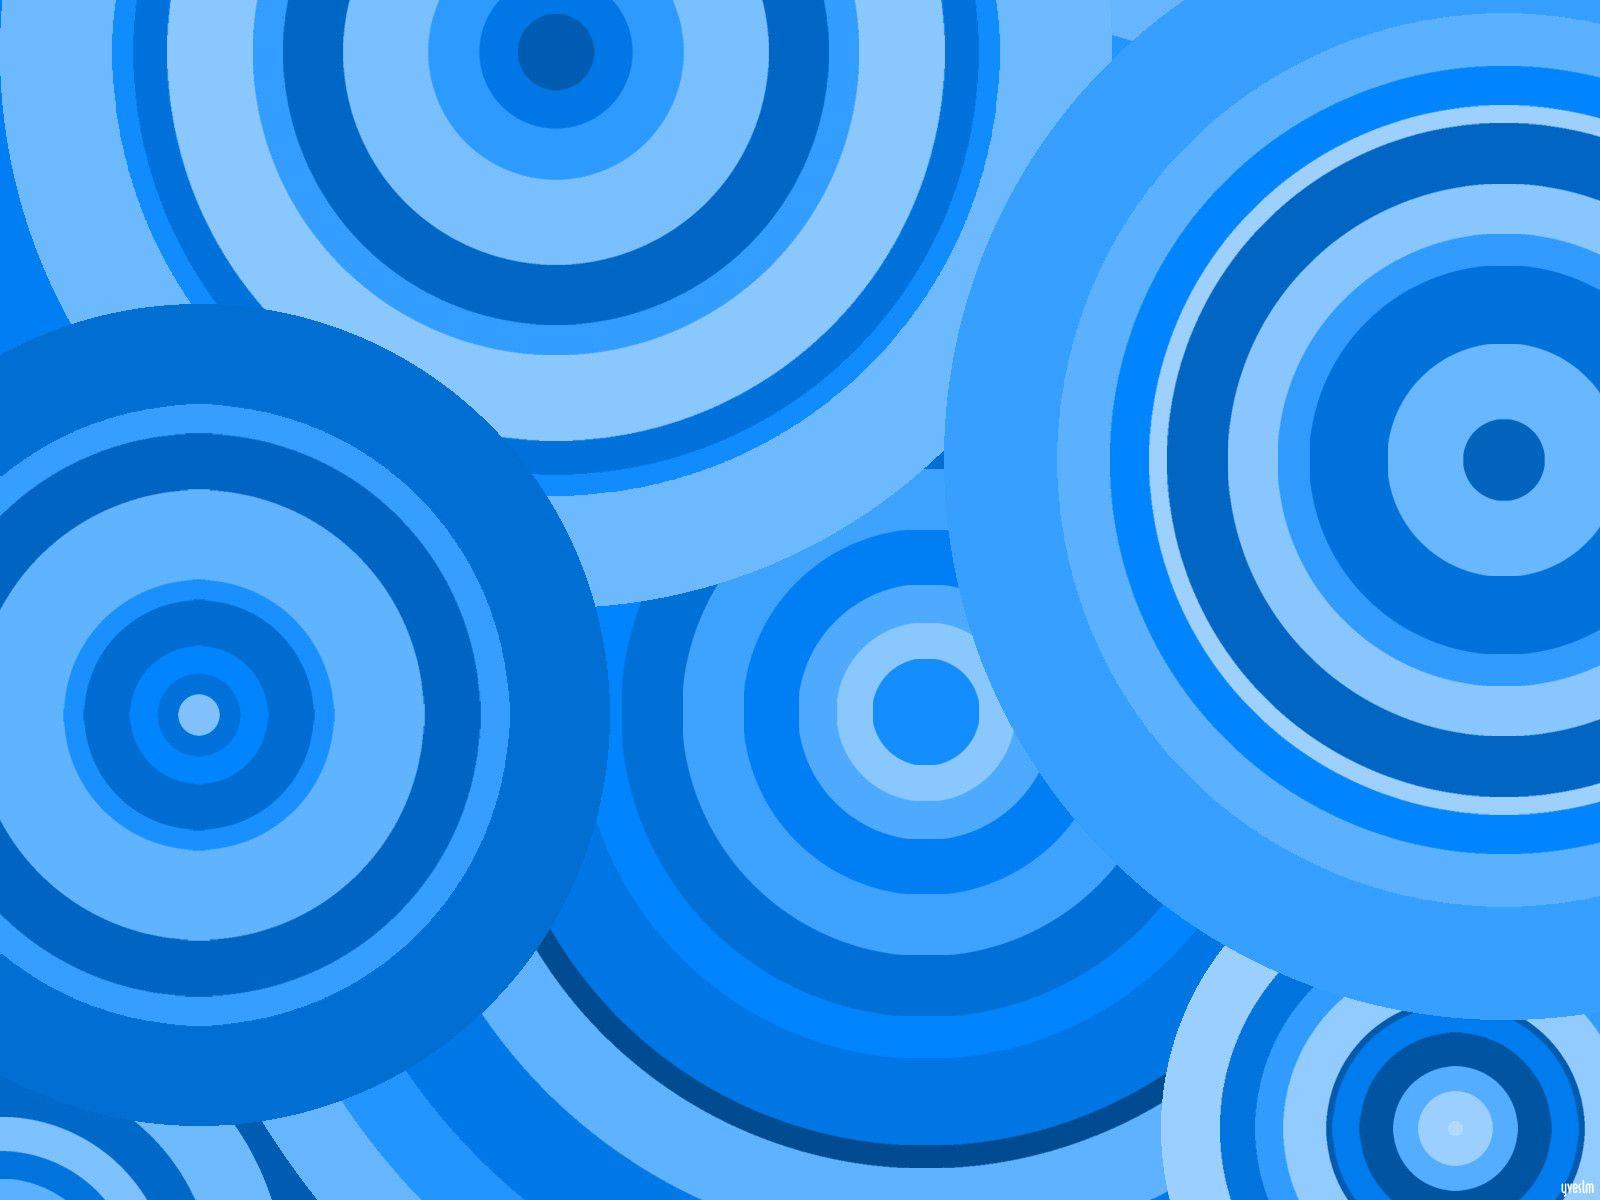 Colorful Circles Wallpaper